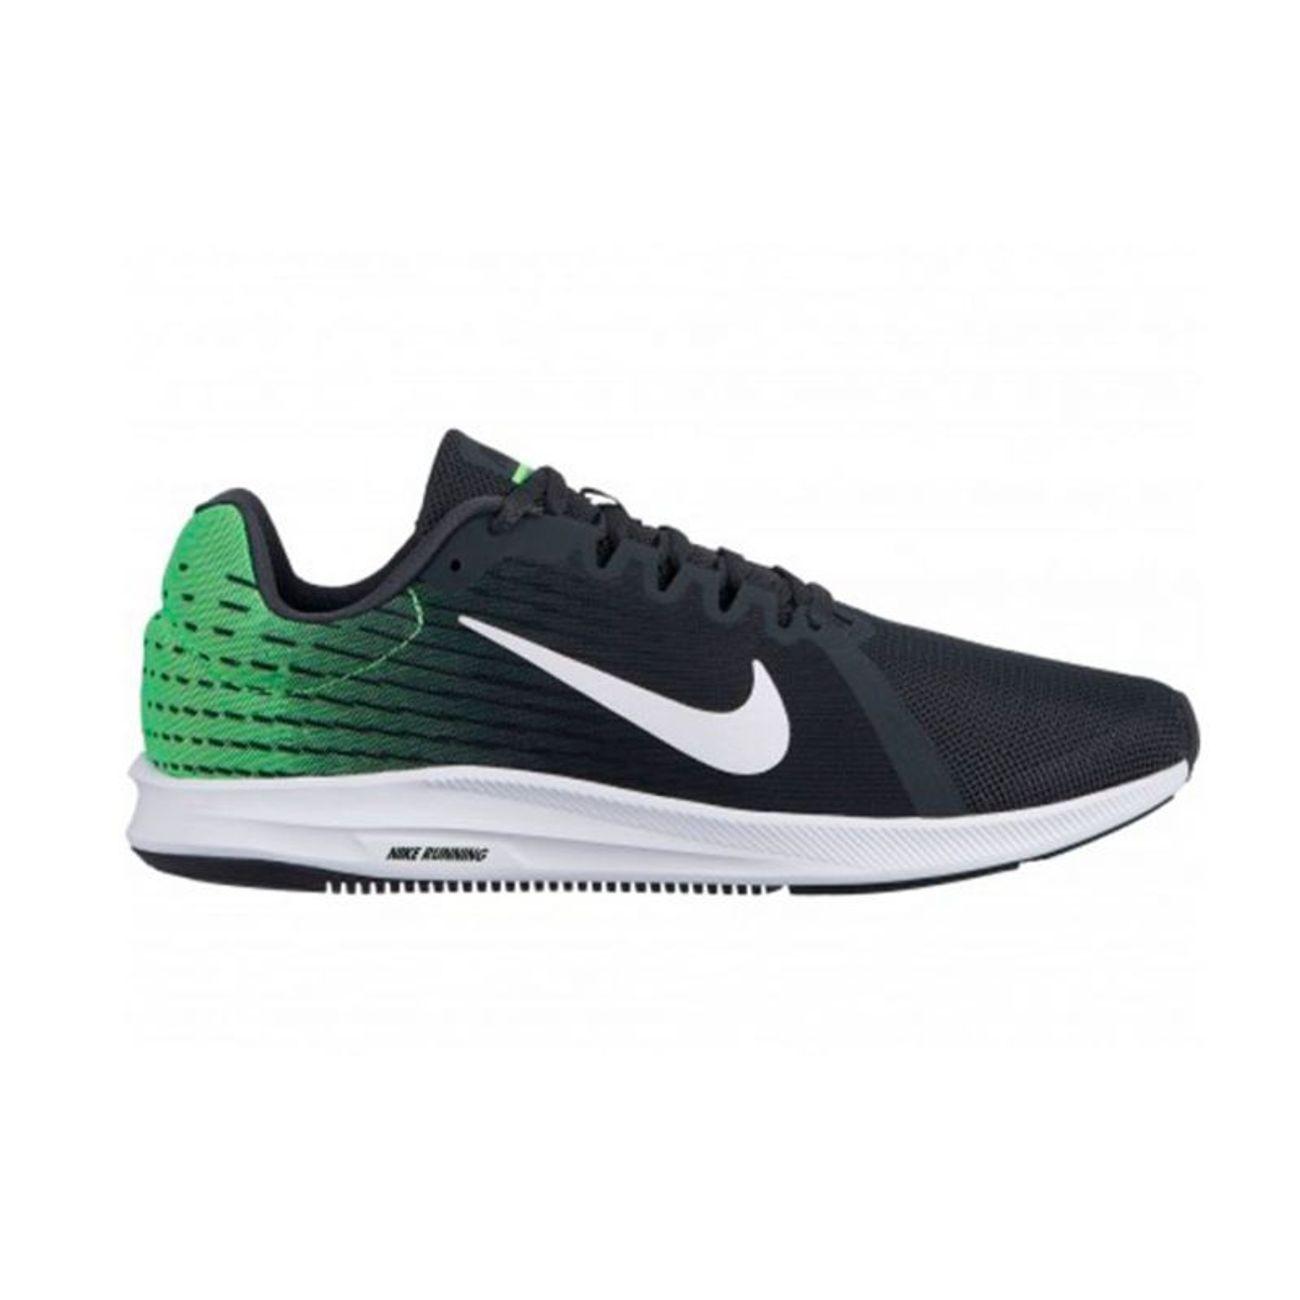 Downshifter Adulte Vert 013 Padel Ni908984 Nike 8 Noir q5RA34jL